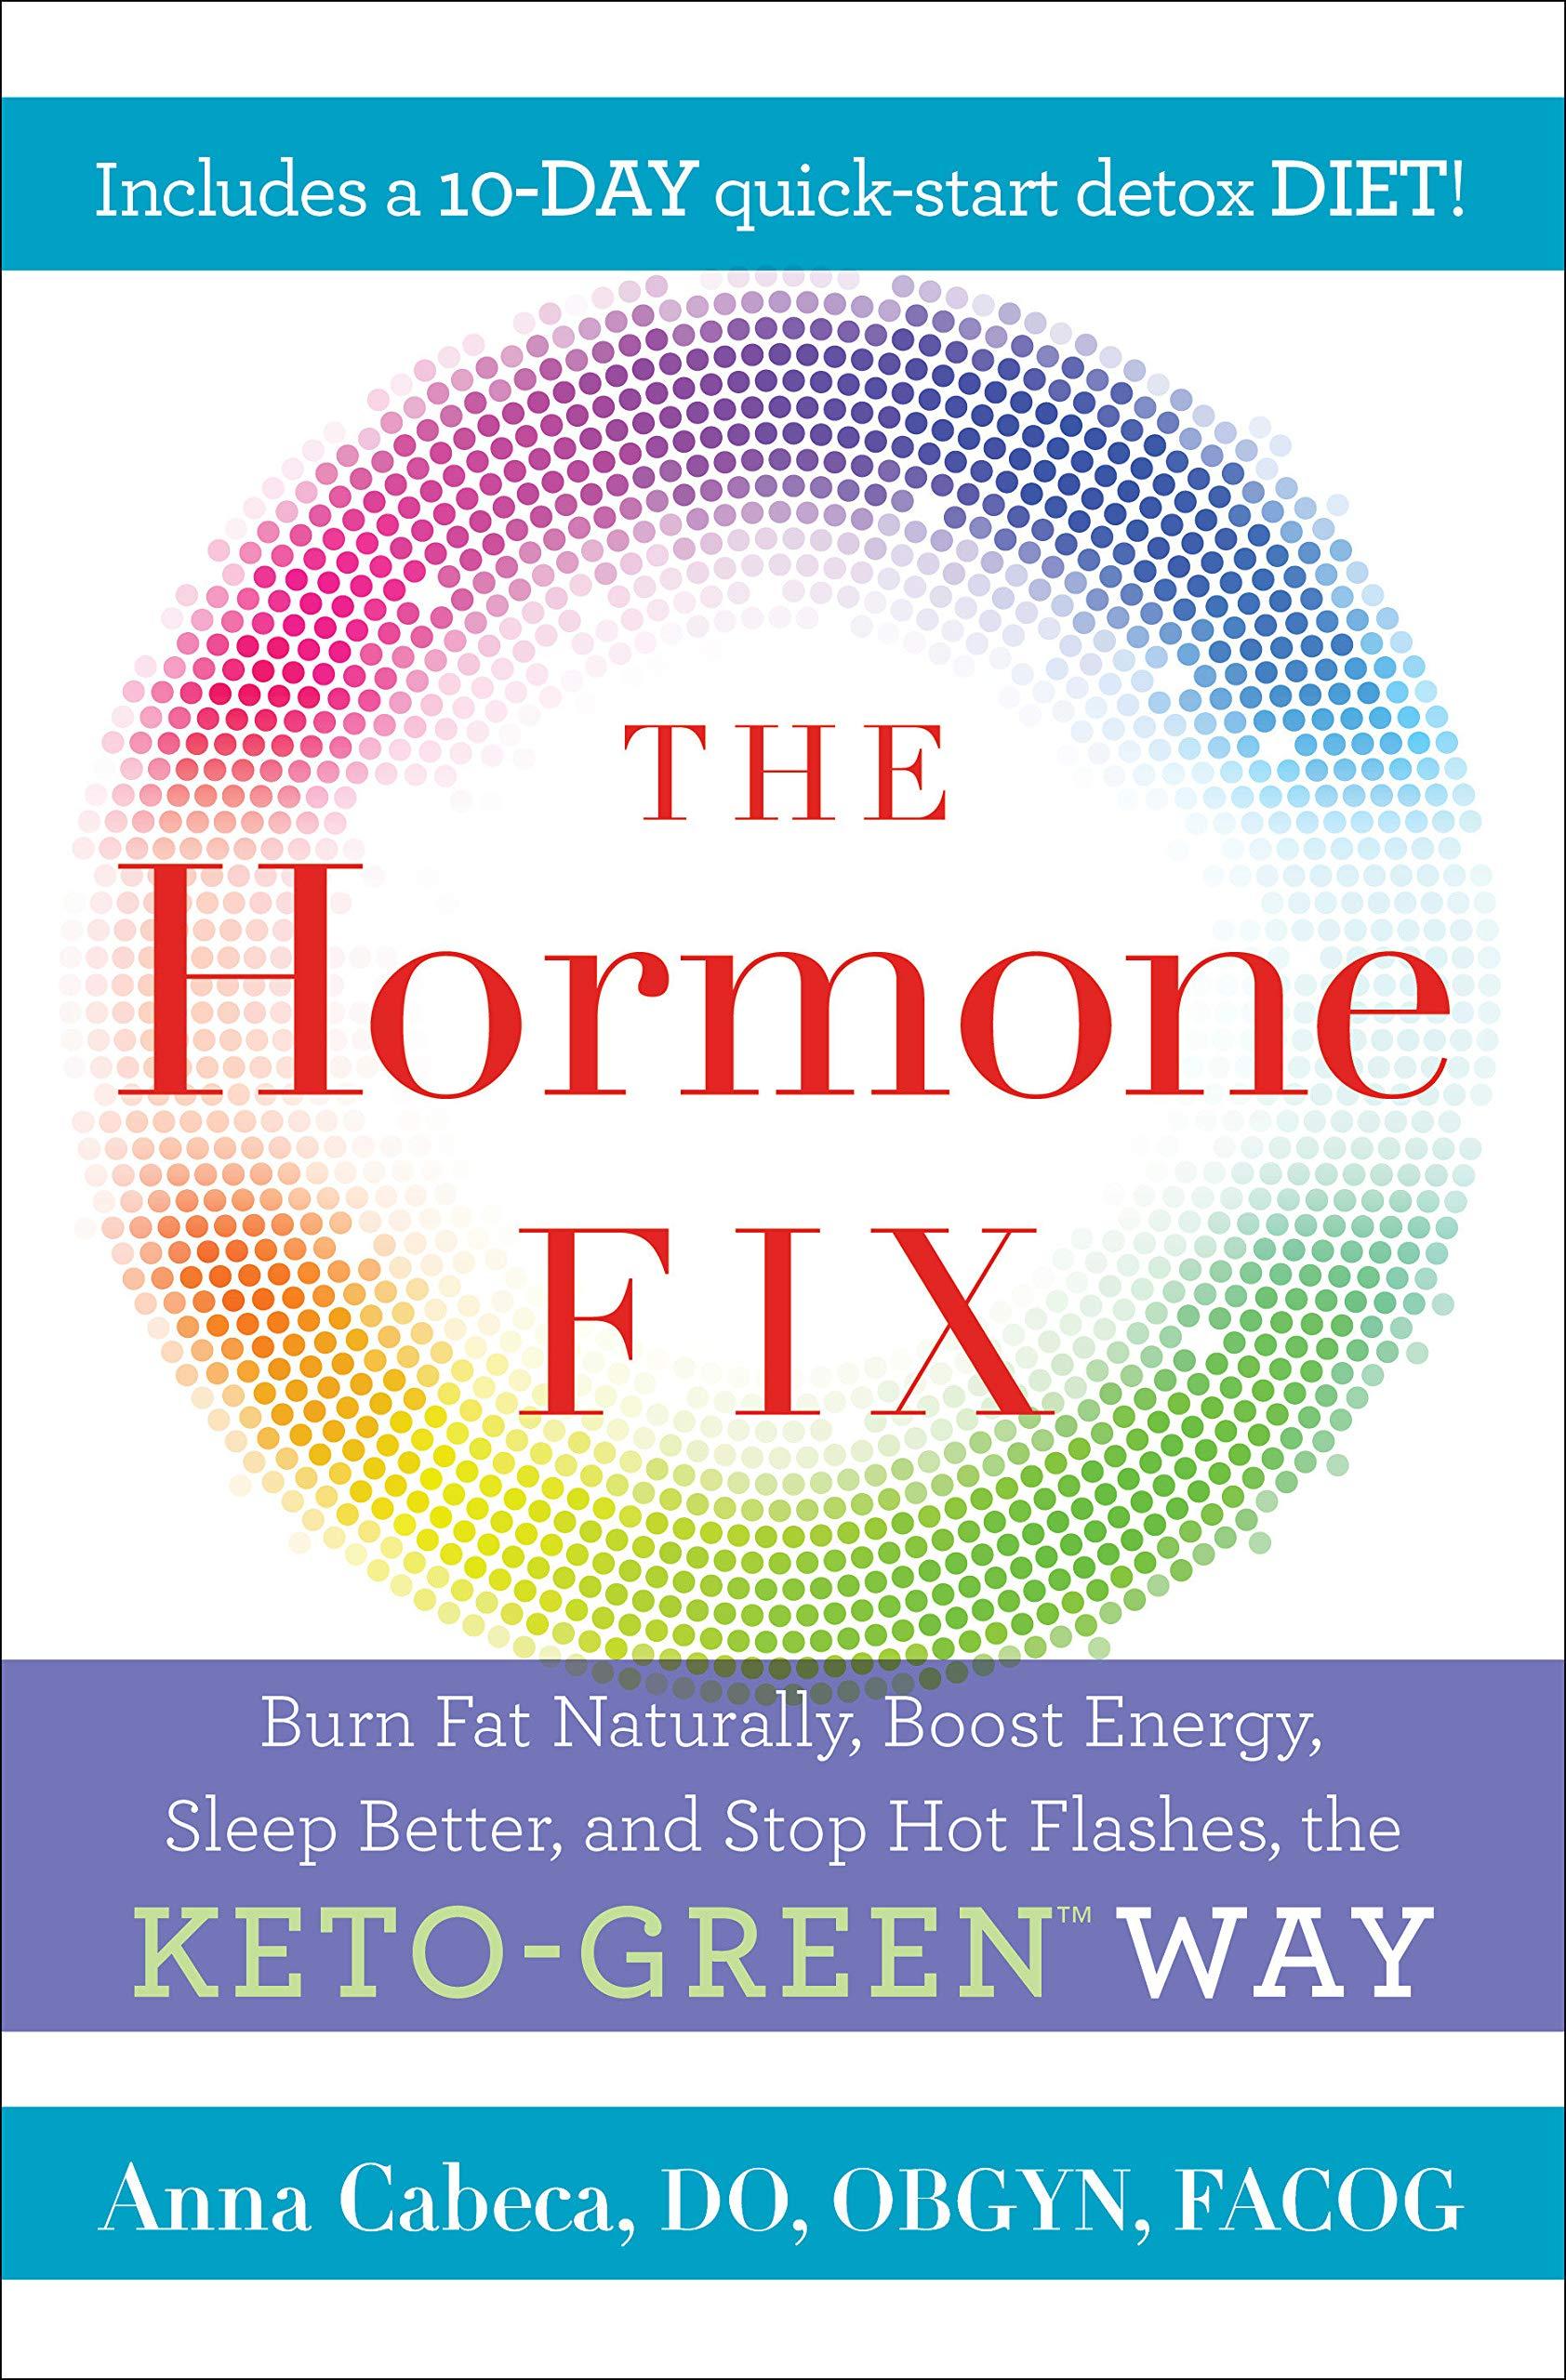 early menopause keto diet